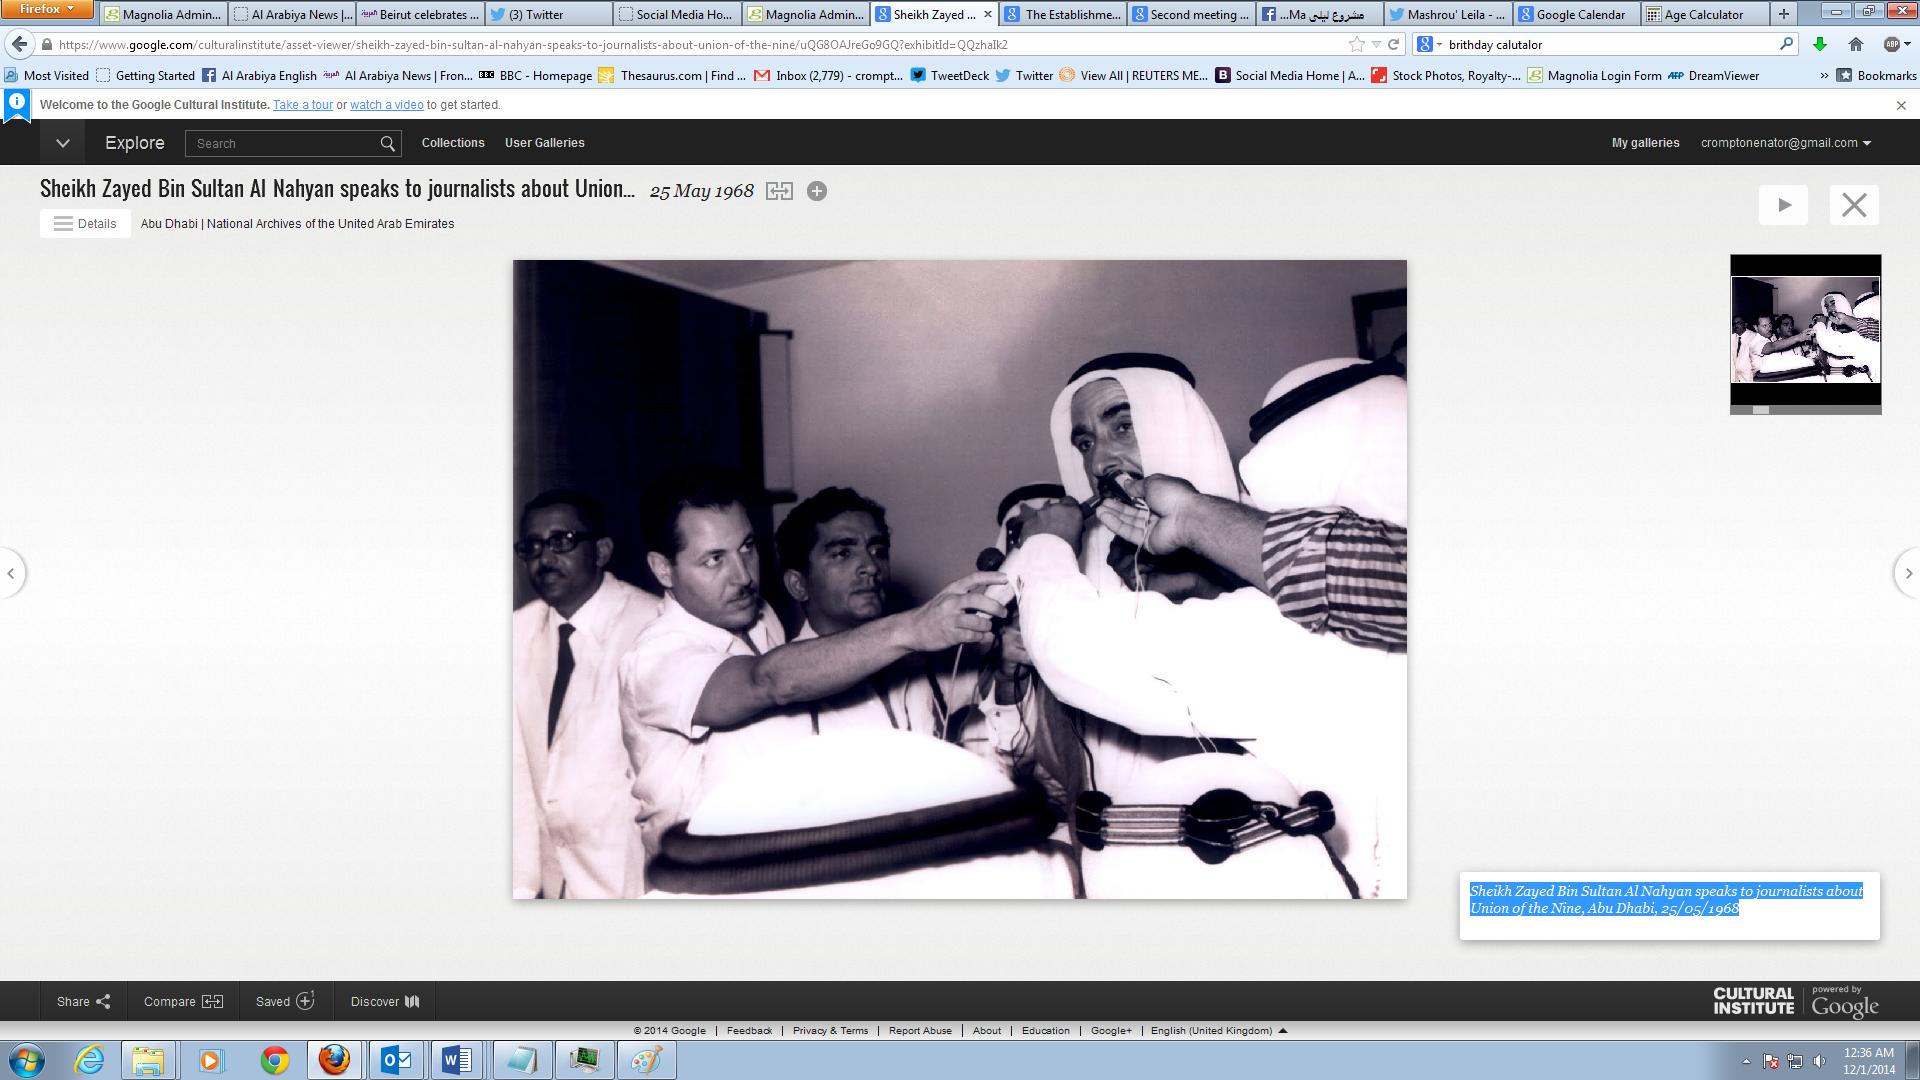 Sheikh Zayed Bin Sultan Al Nahyan speaks to journalists about Union of the Nine, Abu Dhabi, 1968. (